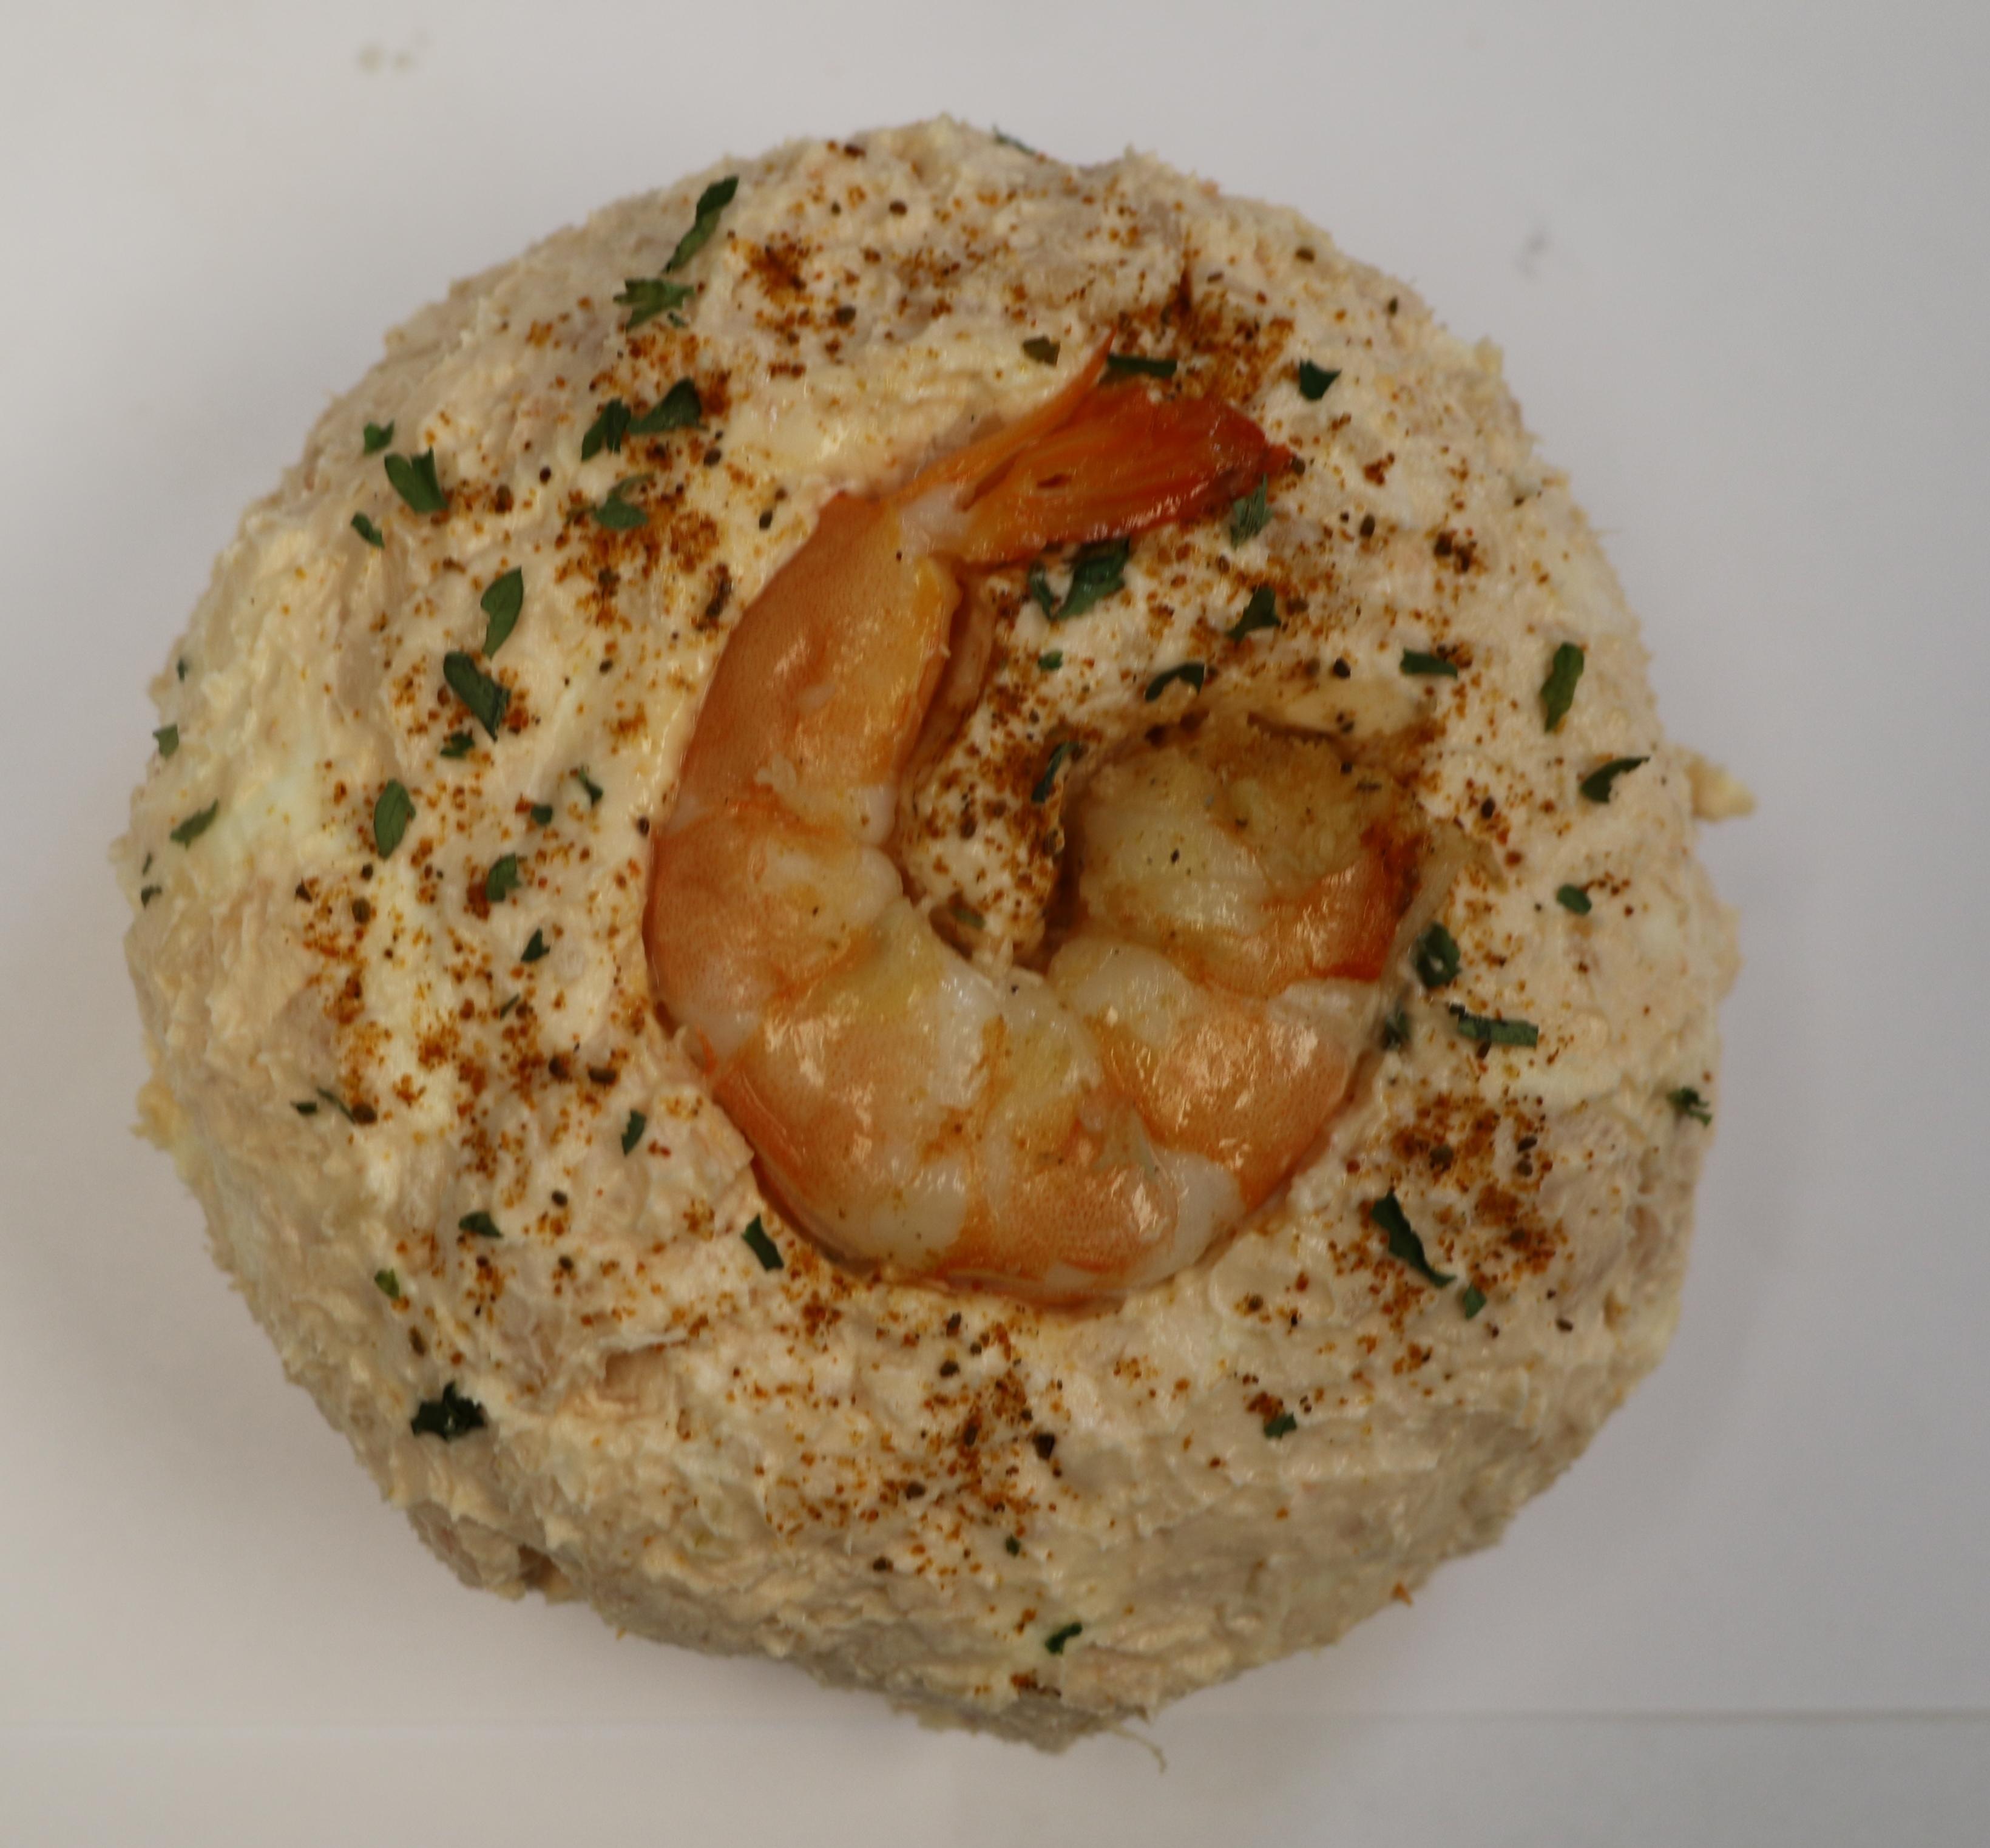 Shrimp Cheeseball Image